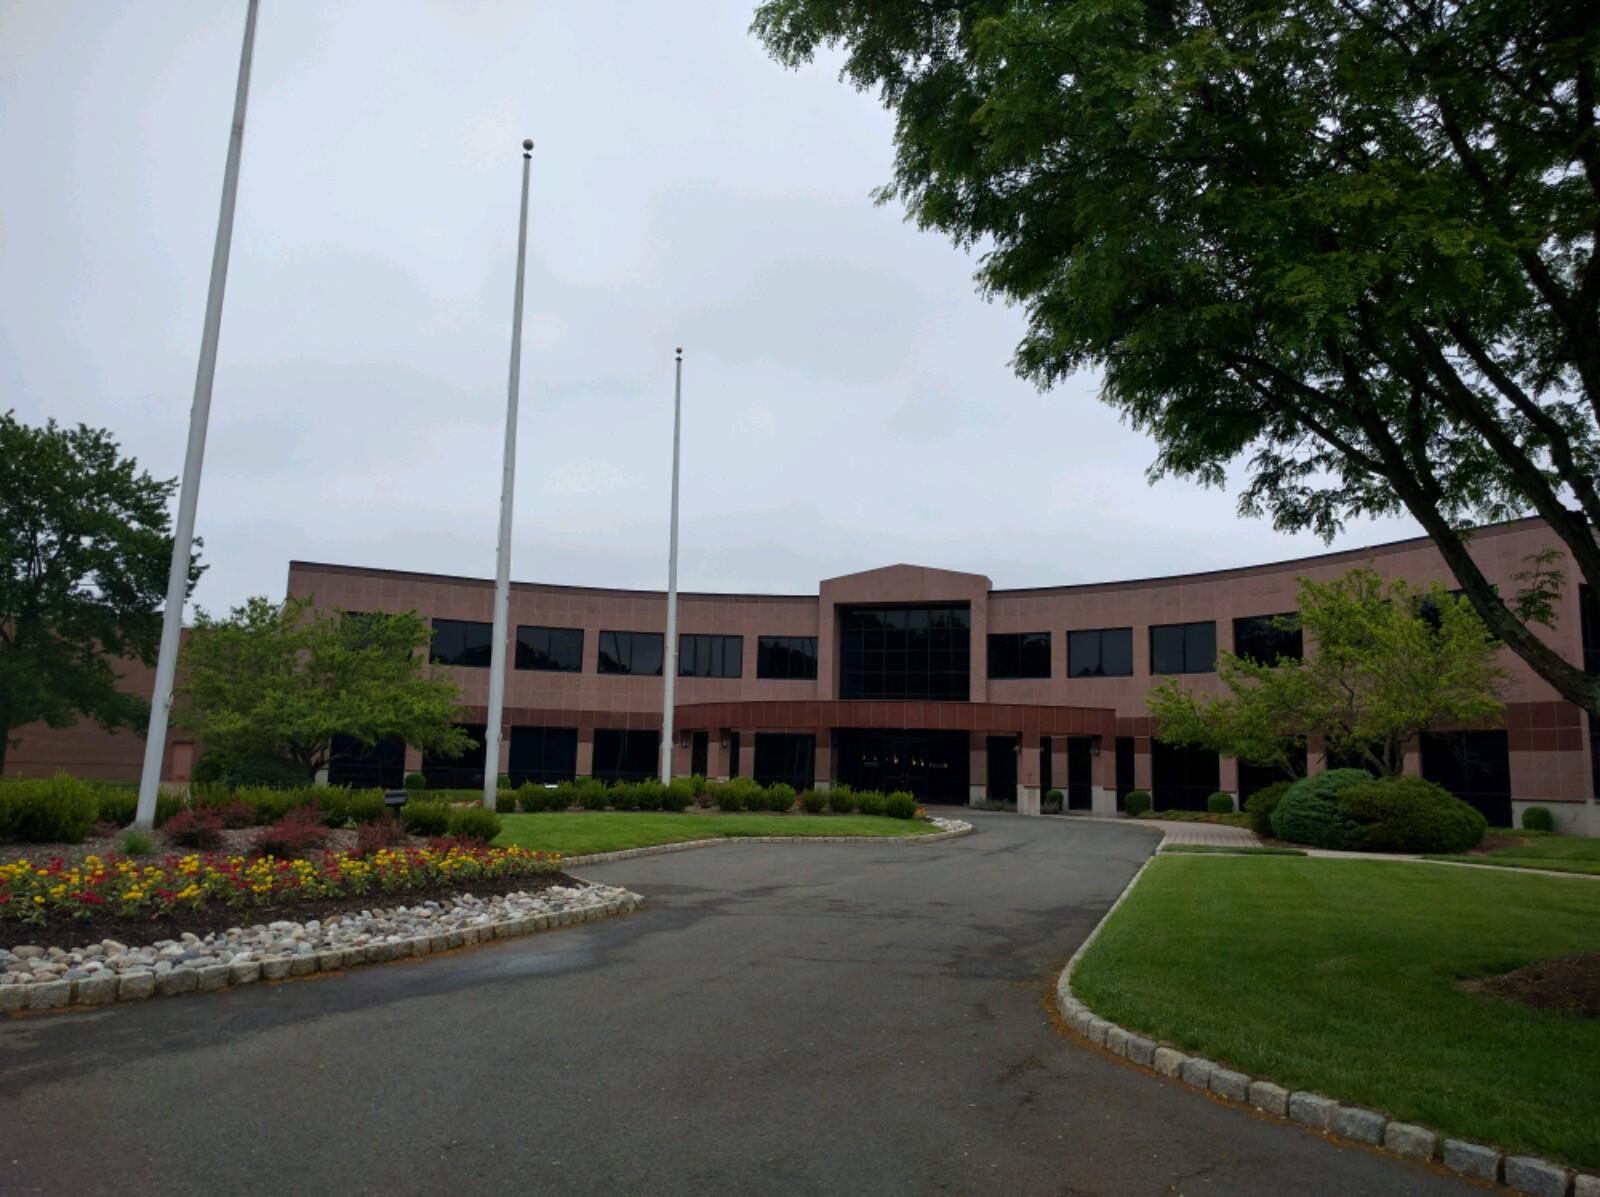 C. R. Bard, Inc.